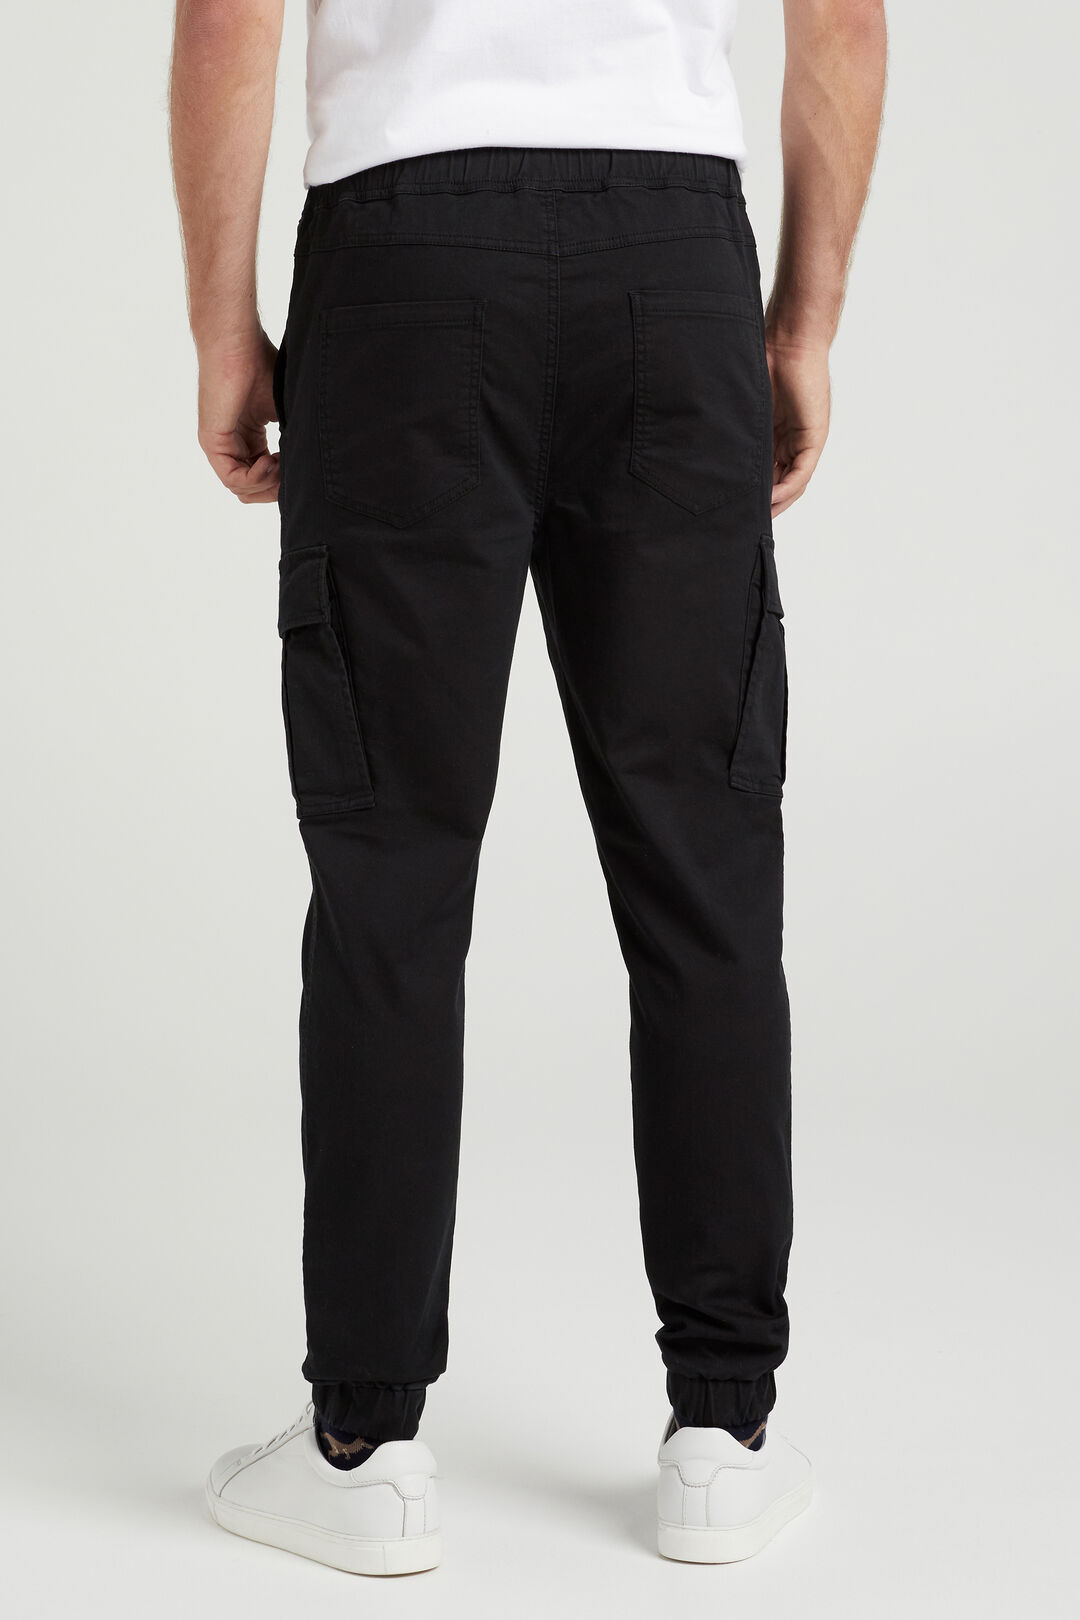 CARGO CASUAL PANT  BLACK  hi-res